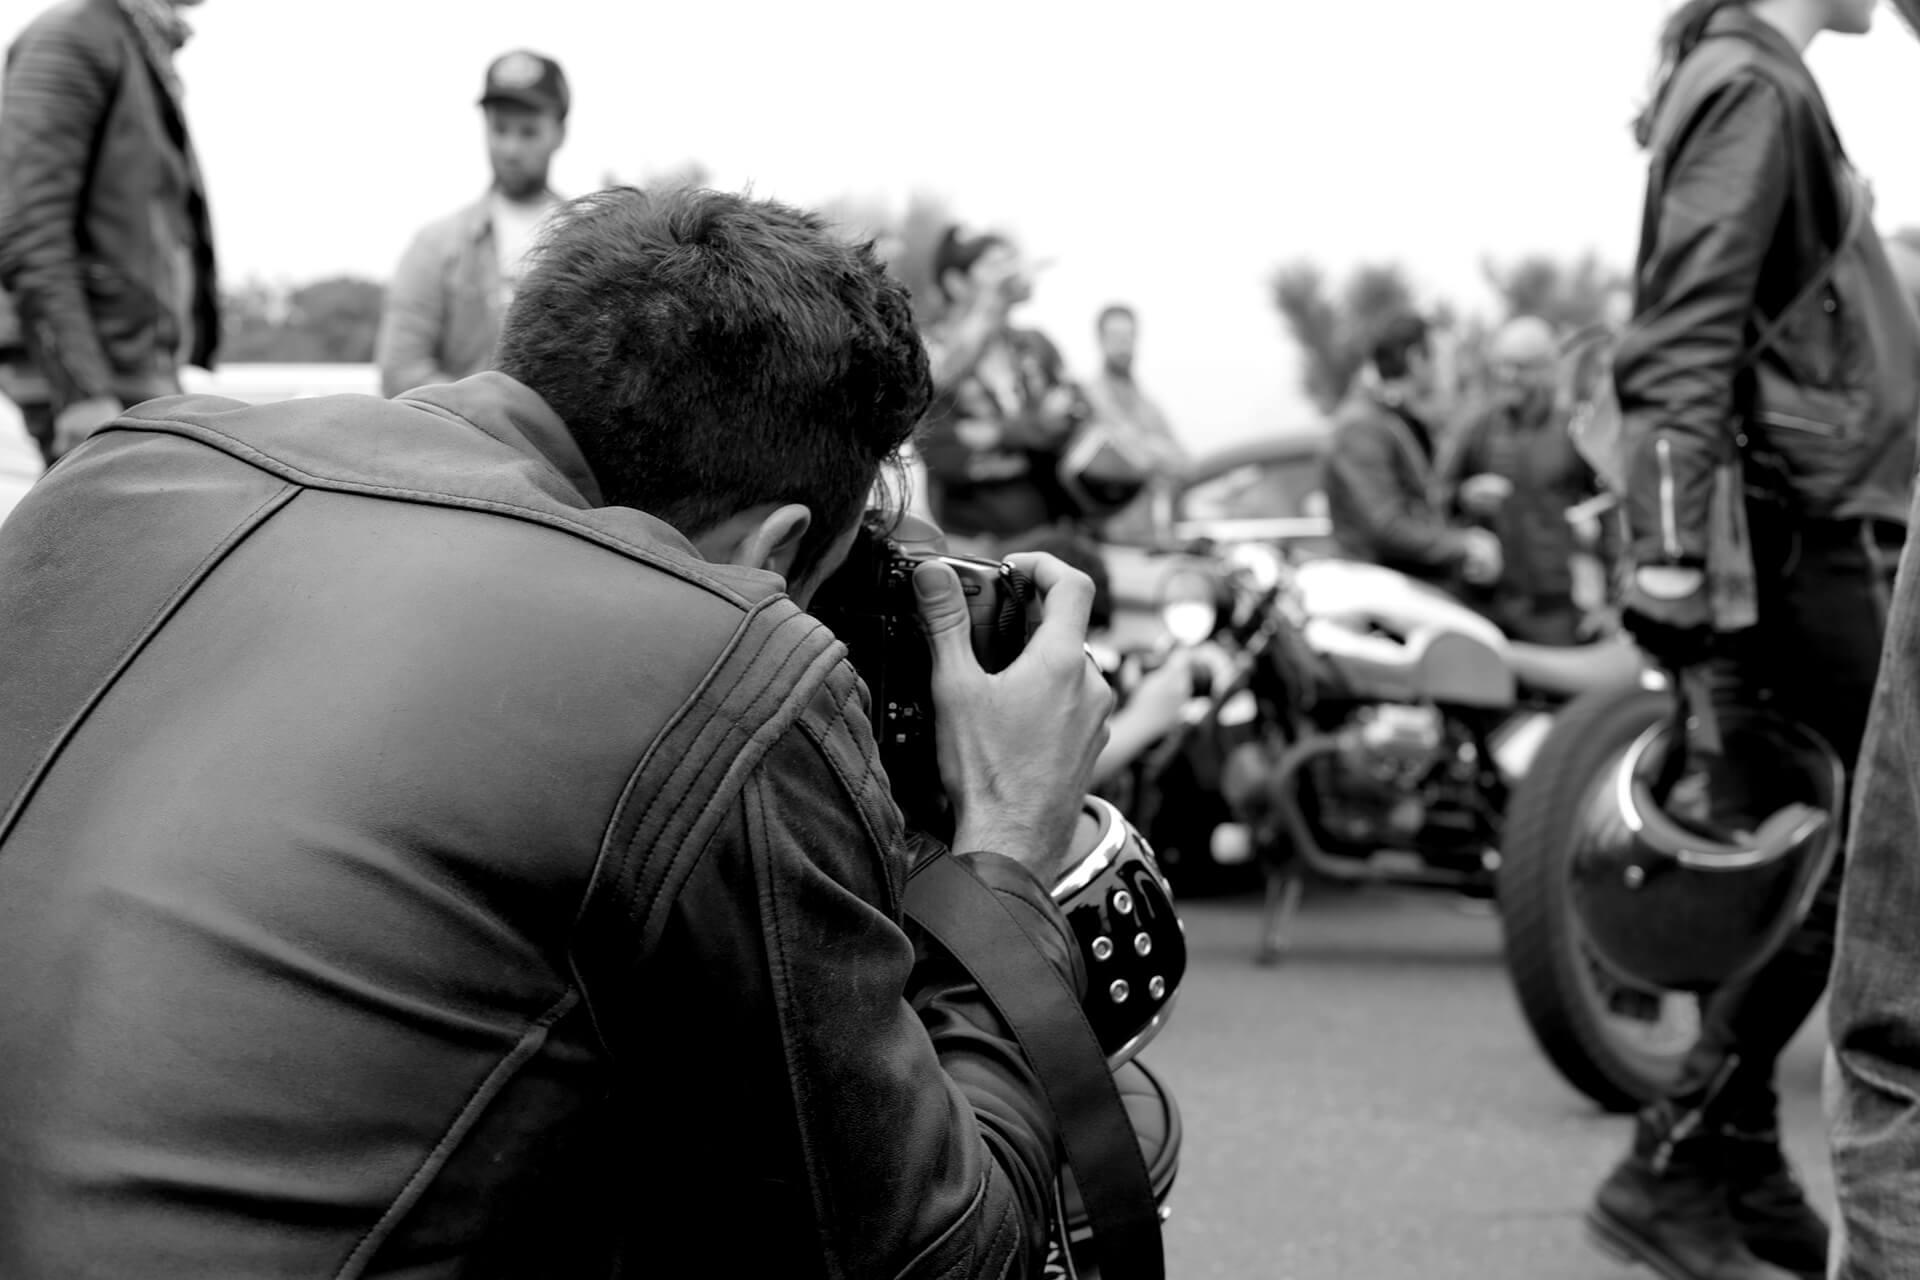 Wheels, Waves, Wheels and Waves, fashion, helmet, sparkle, biker, motorcycle, bike, france, film, photography, event, WeAreShuffle, photographer